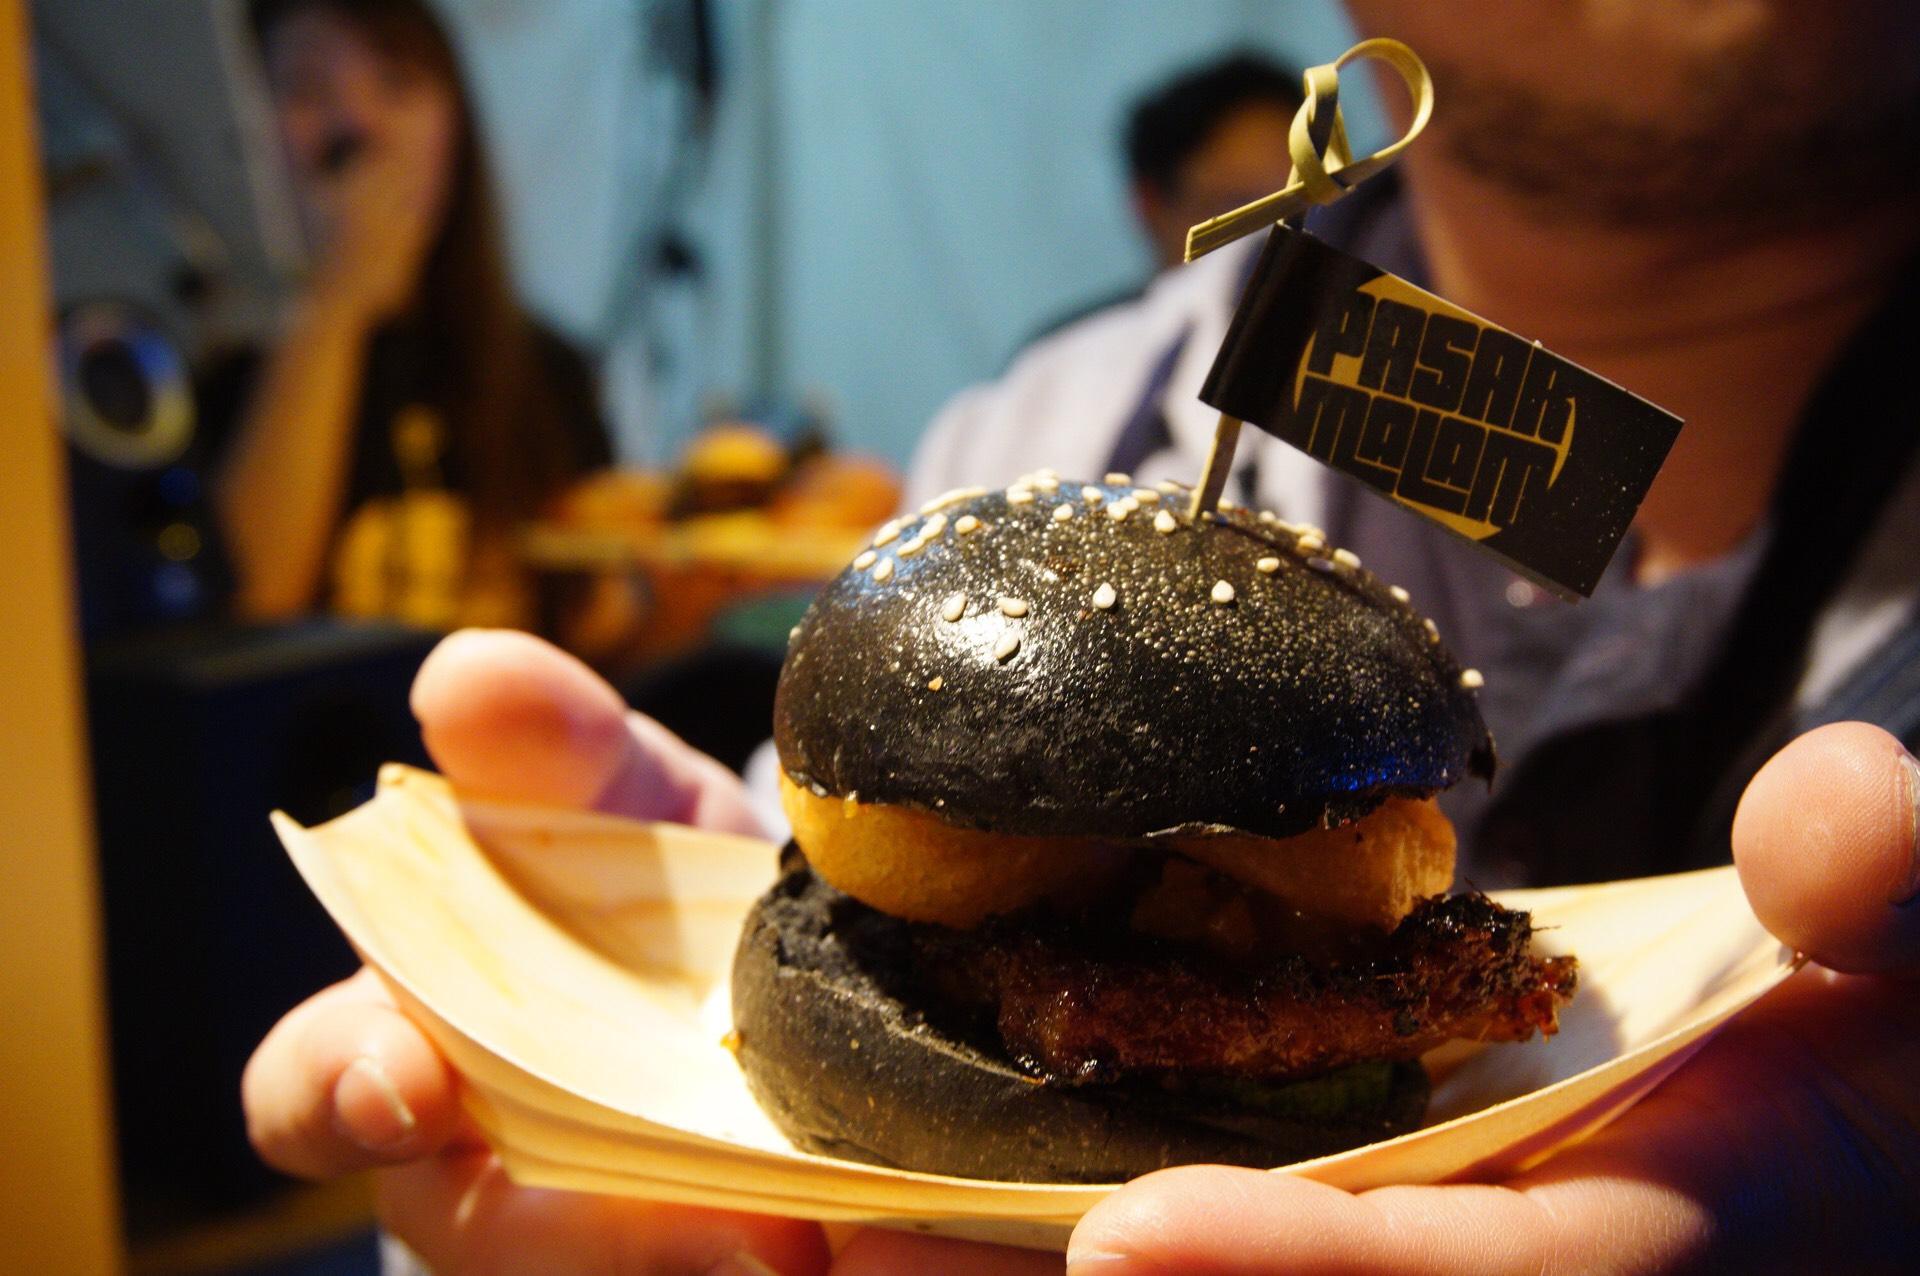 POrk BElly slider has onion rings, cucumber, peanut sauce, sandwiched in charcoal brioche bun